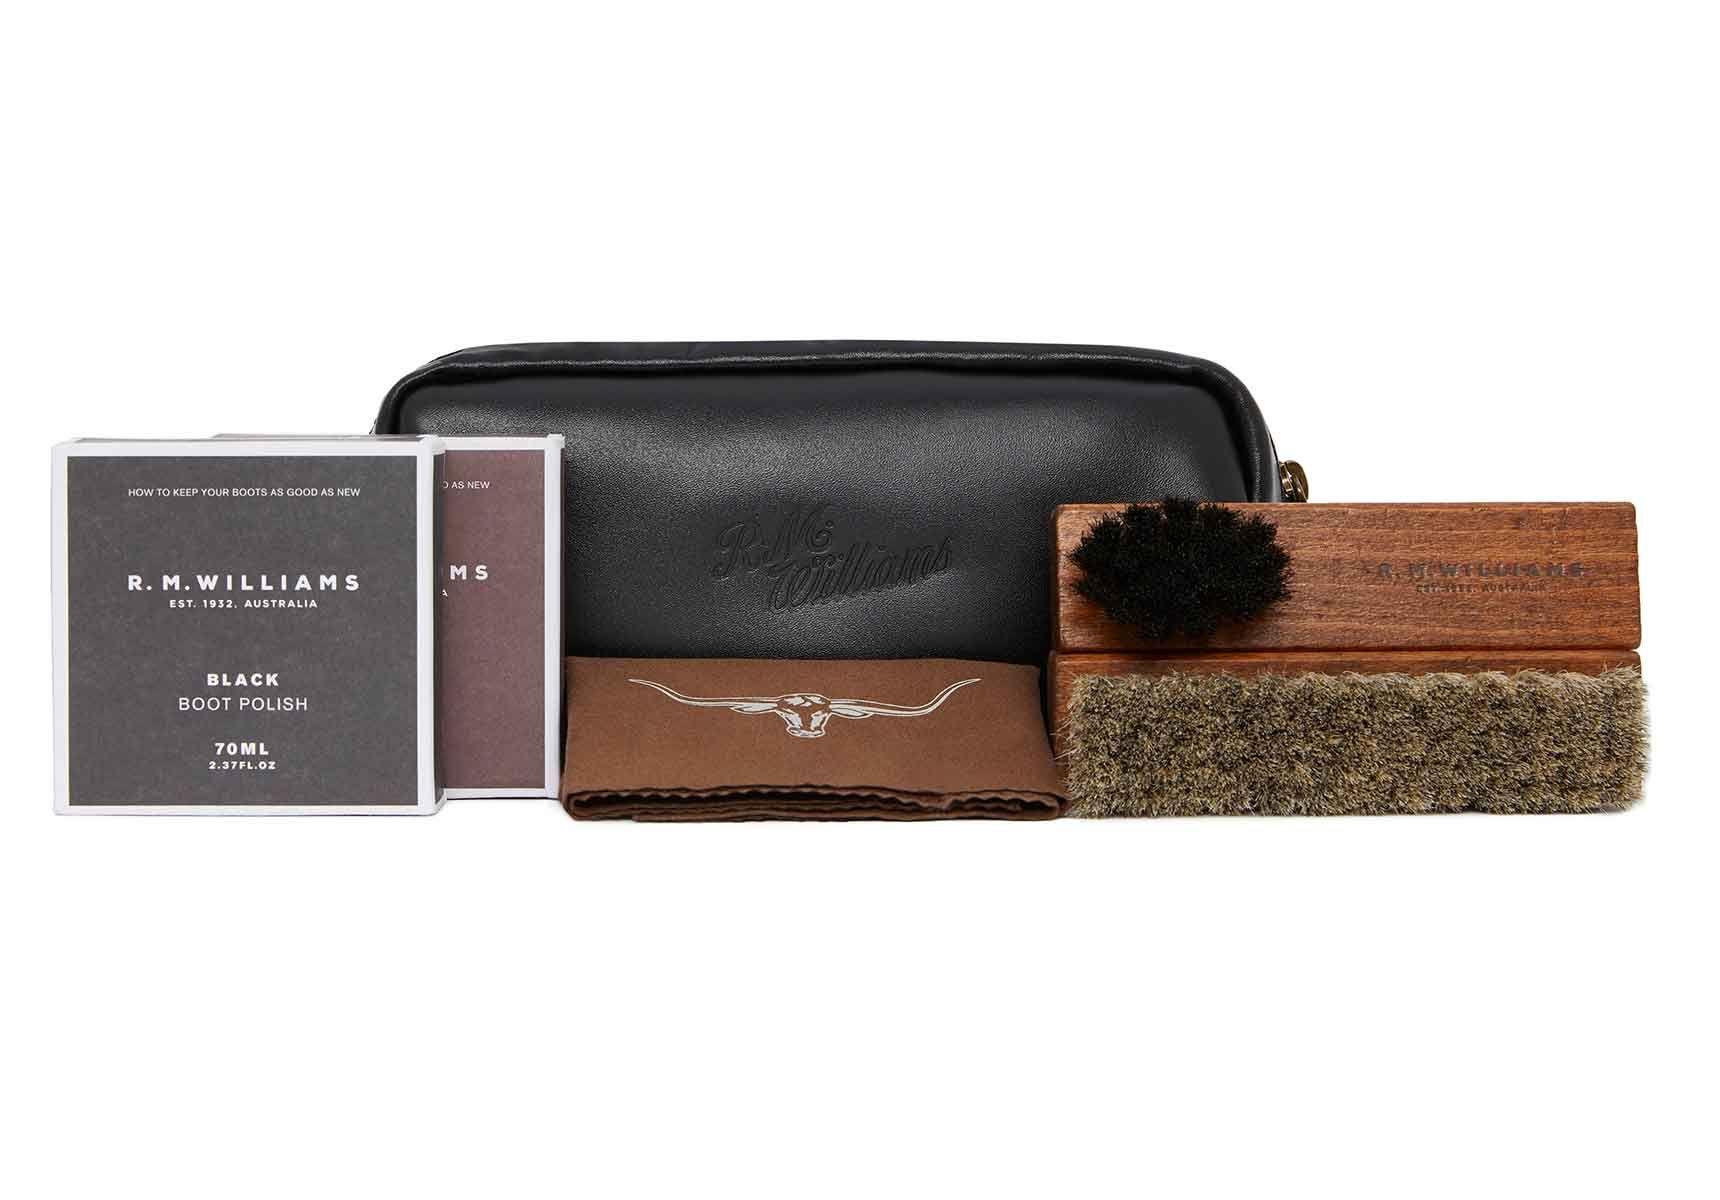 R.M. Williams Leather Travel Care Kit